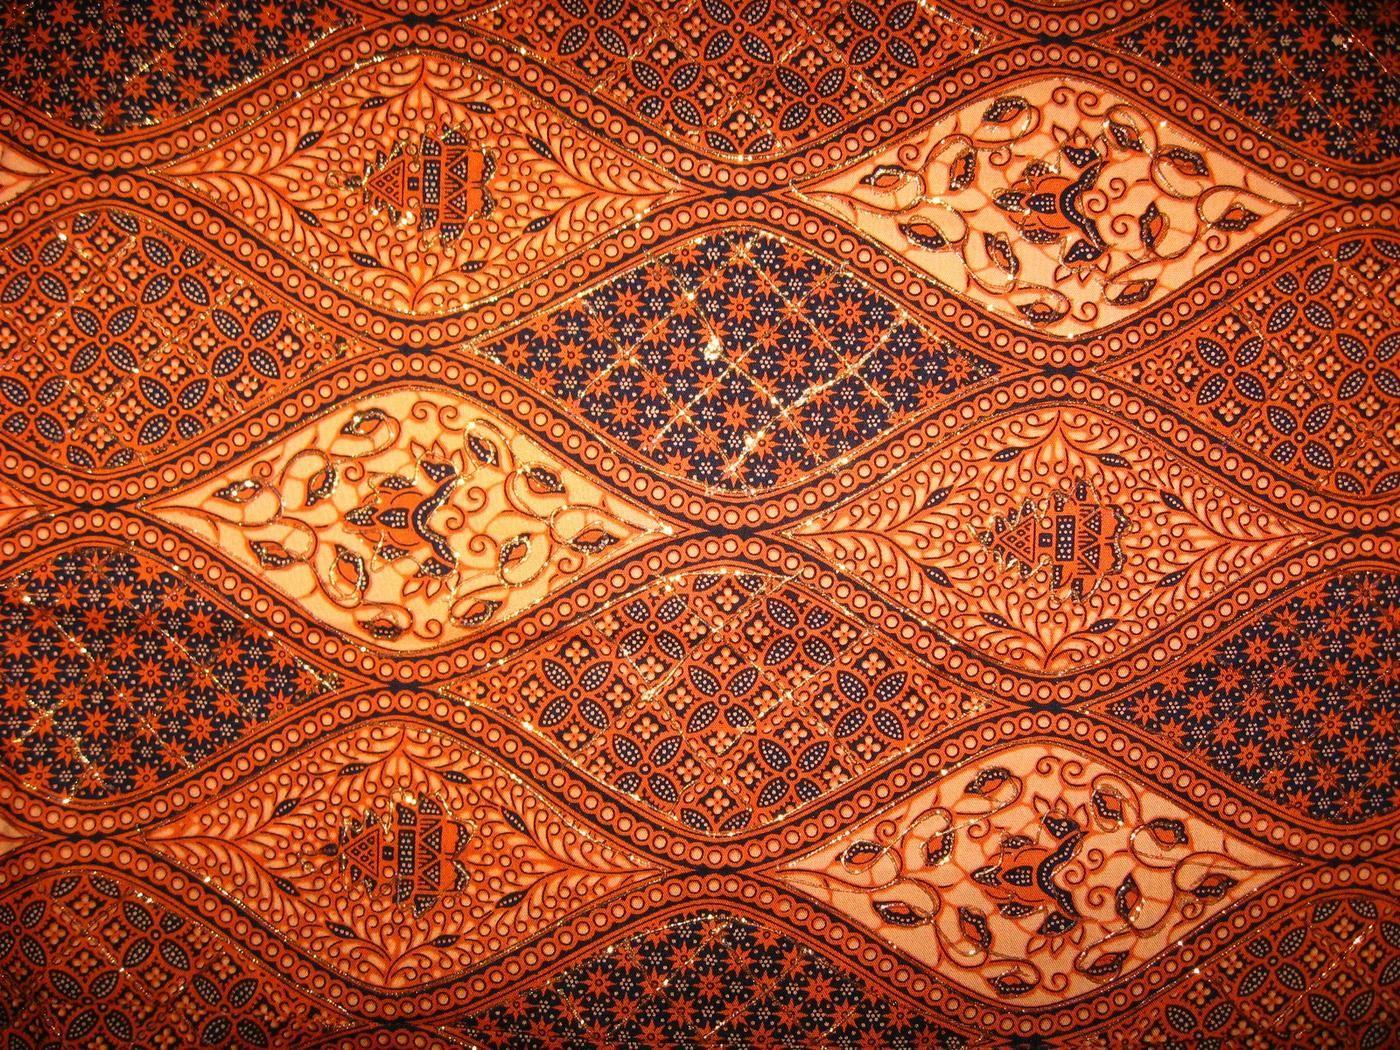 Jadi kesenian batik ini di Indonesia telah dikenal sejak zaman